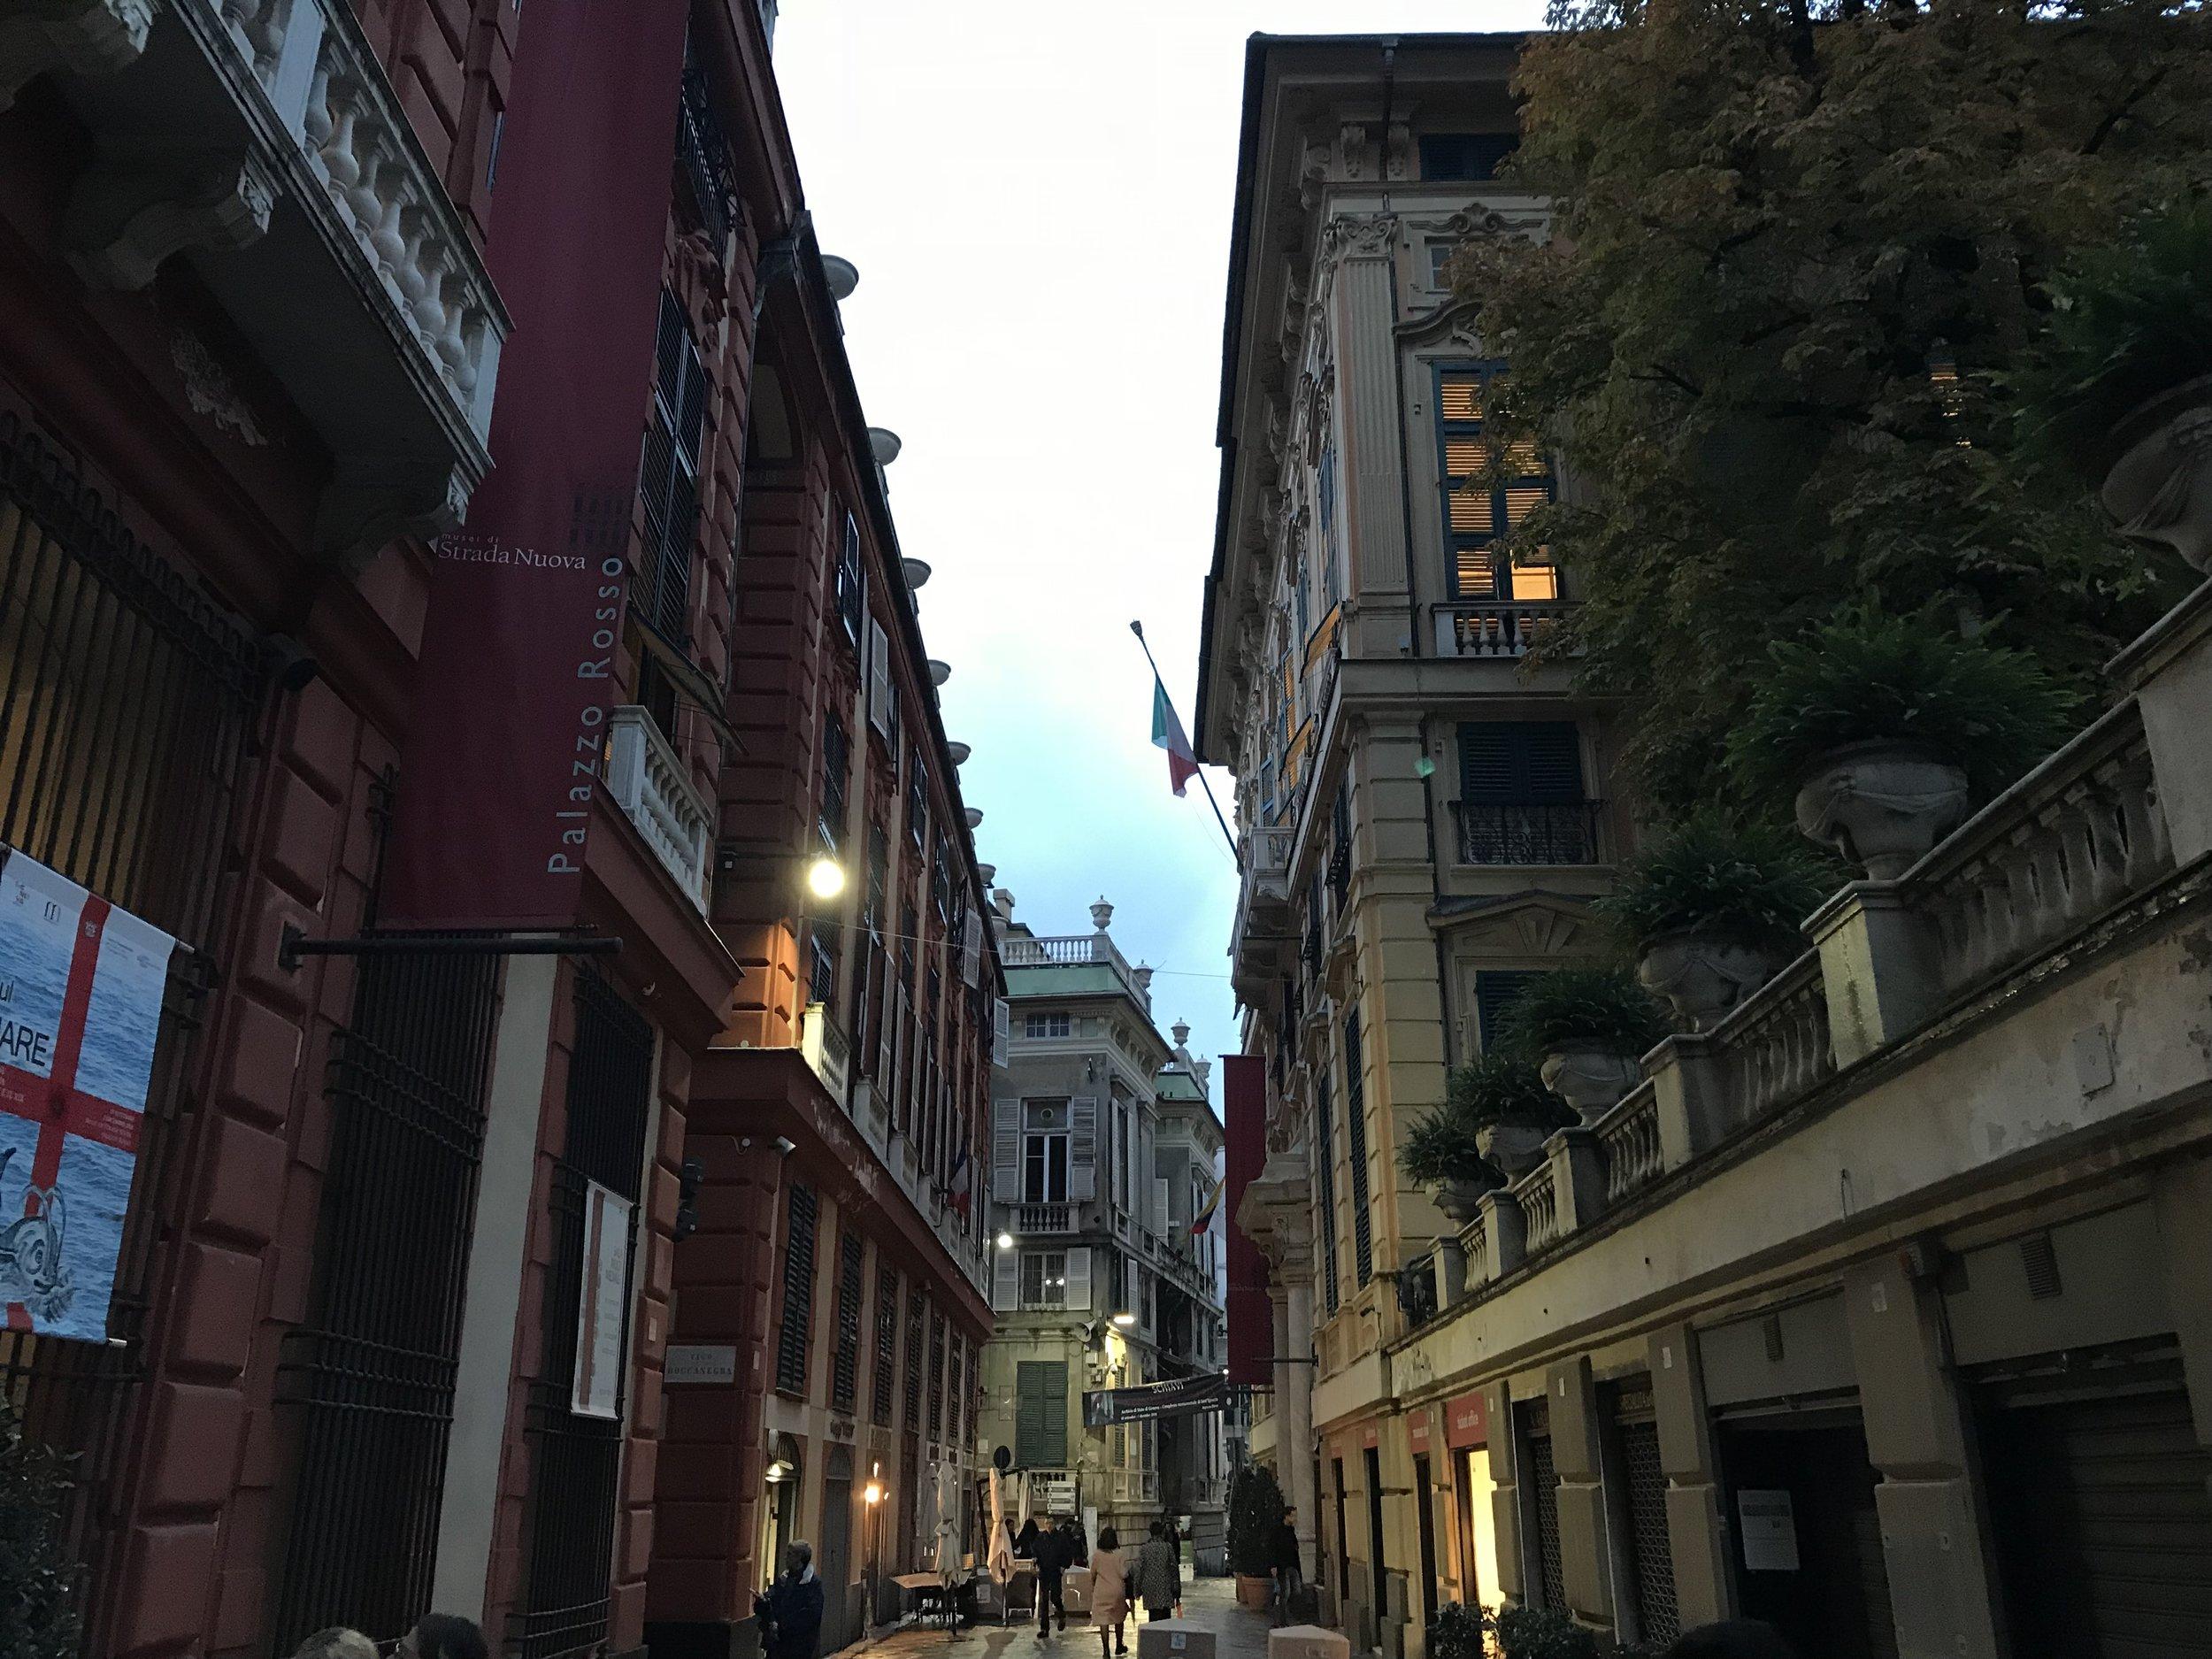 genoa street with palaces.jpeg